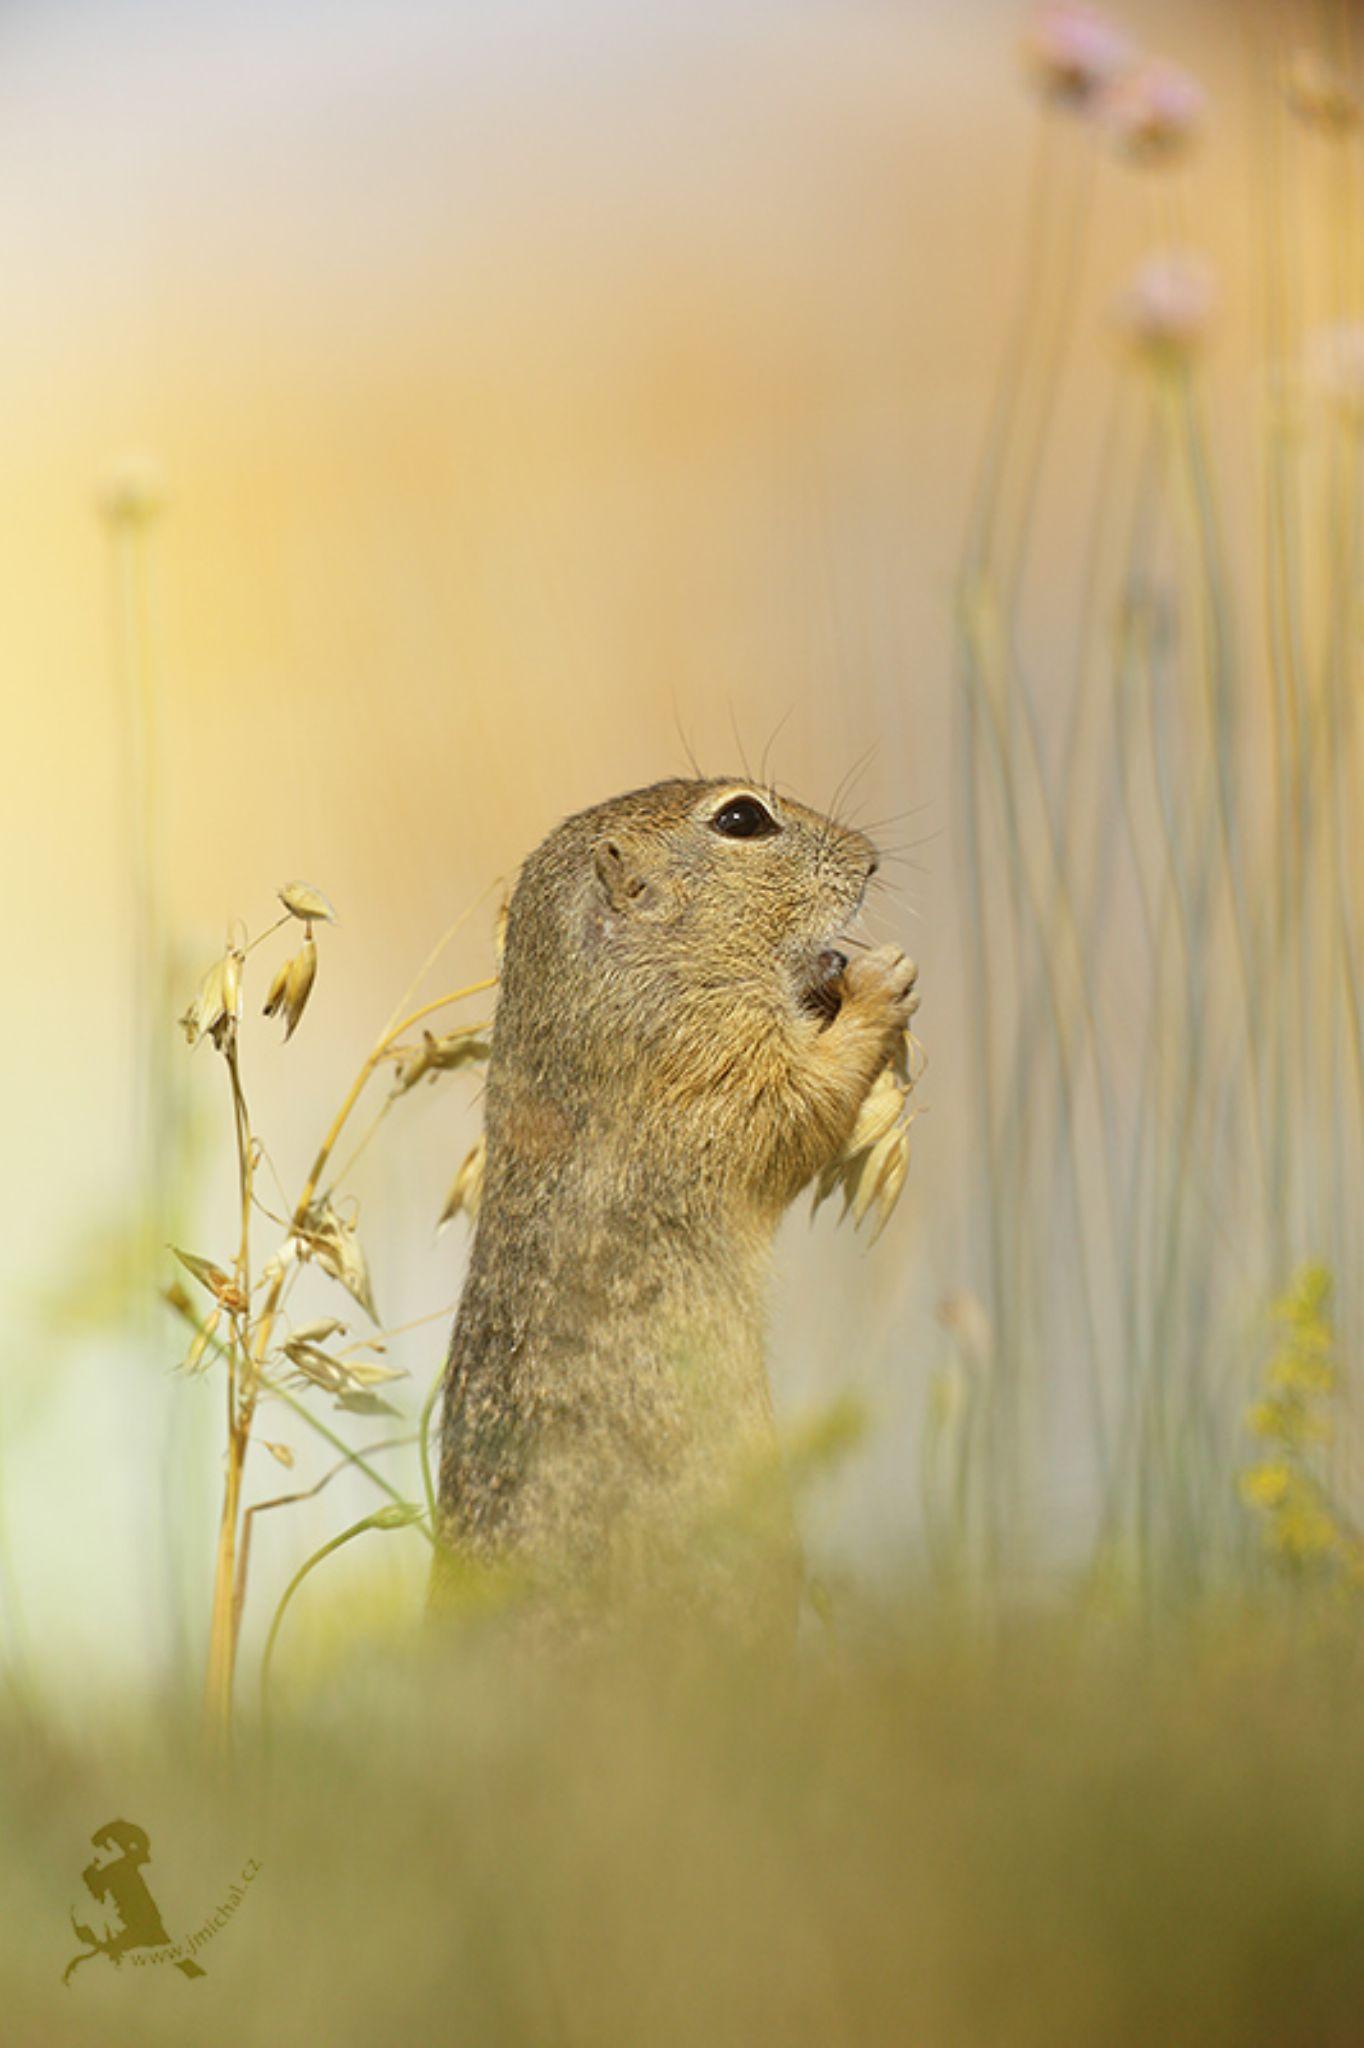 Ground Squirrel by MichalJiri